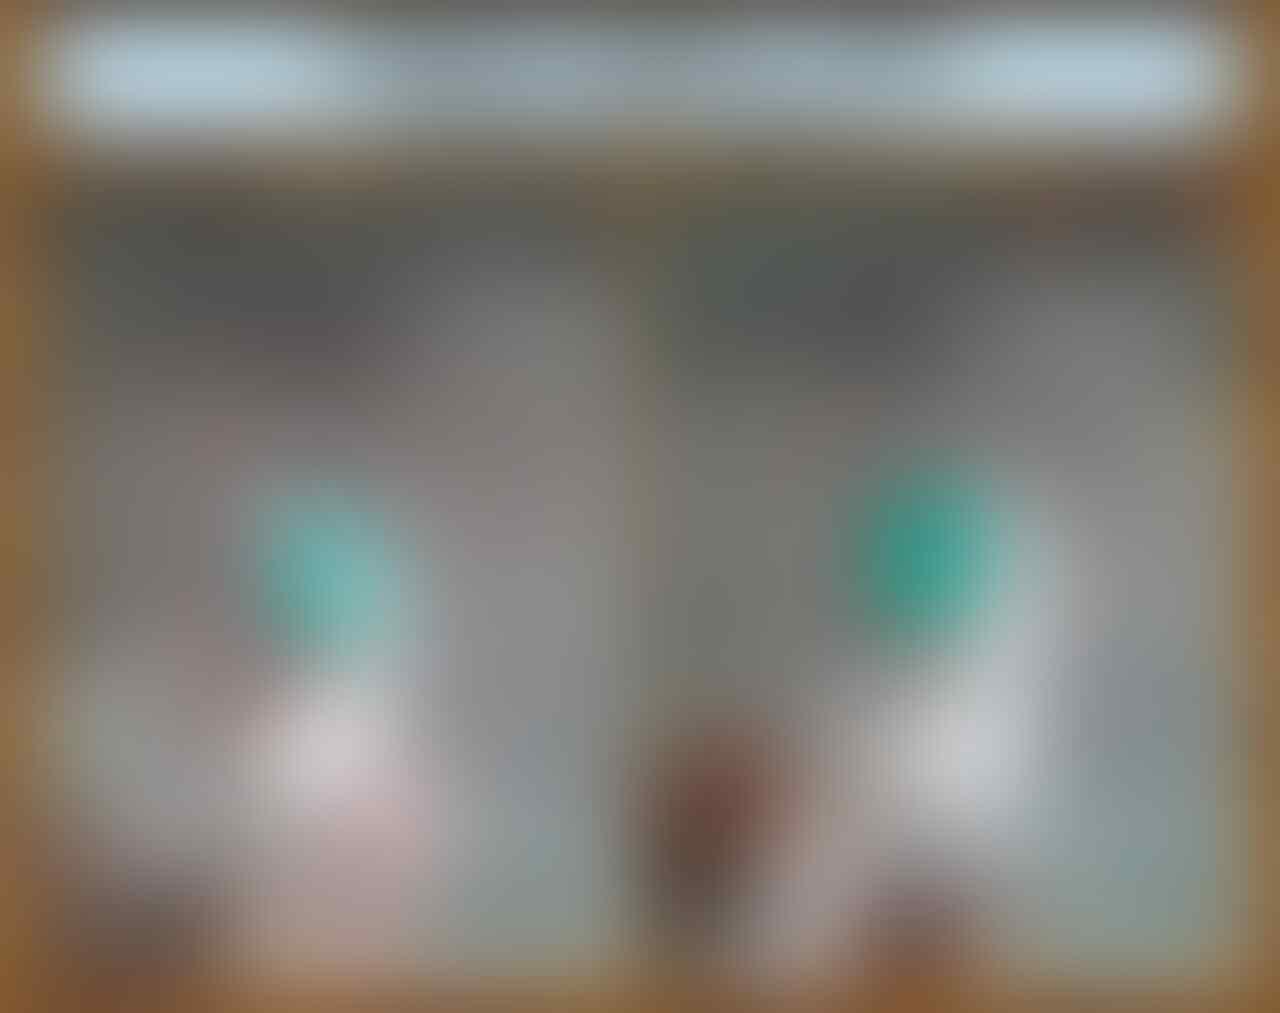 LELANG RAMDHAN1397 #27 BATU KULON, SAFIR, TOPAS END SELASA 02-06-2015 22.15 WIB